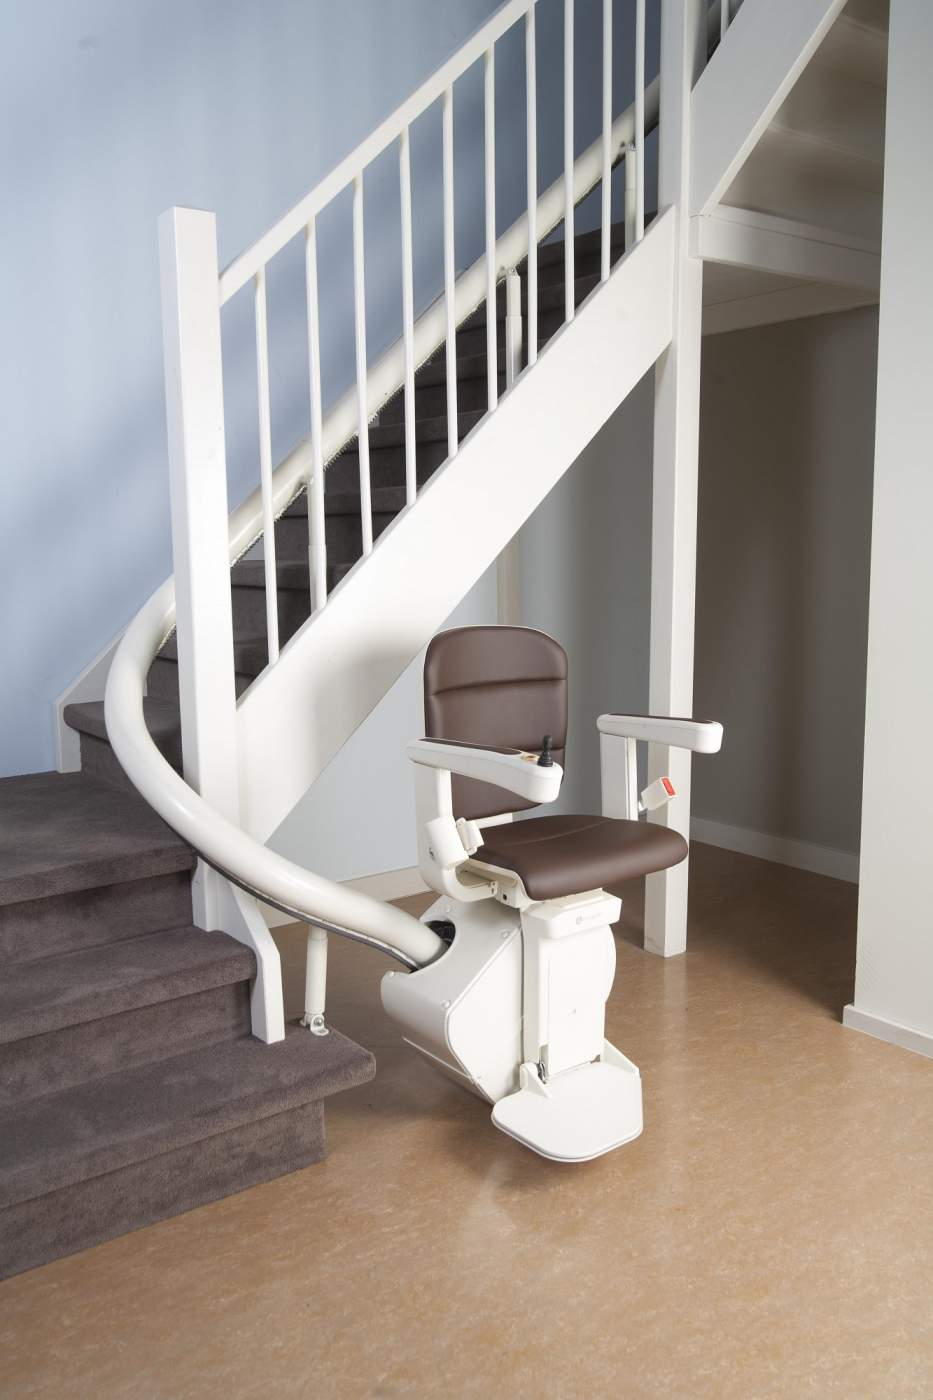 monte escalier a toulouse